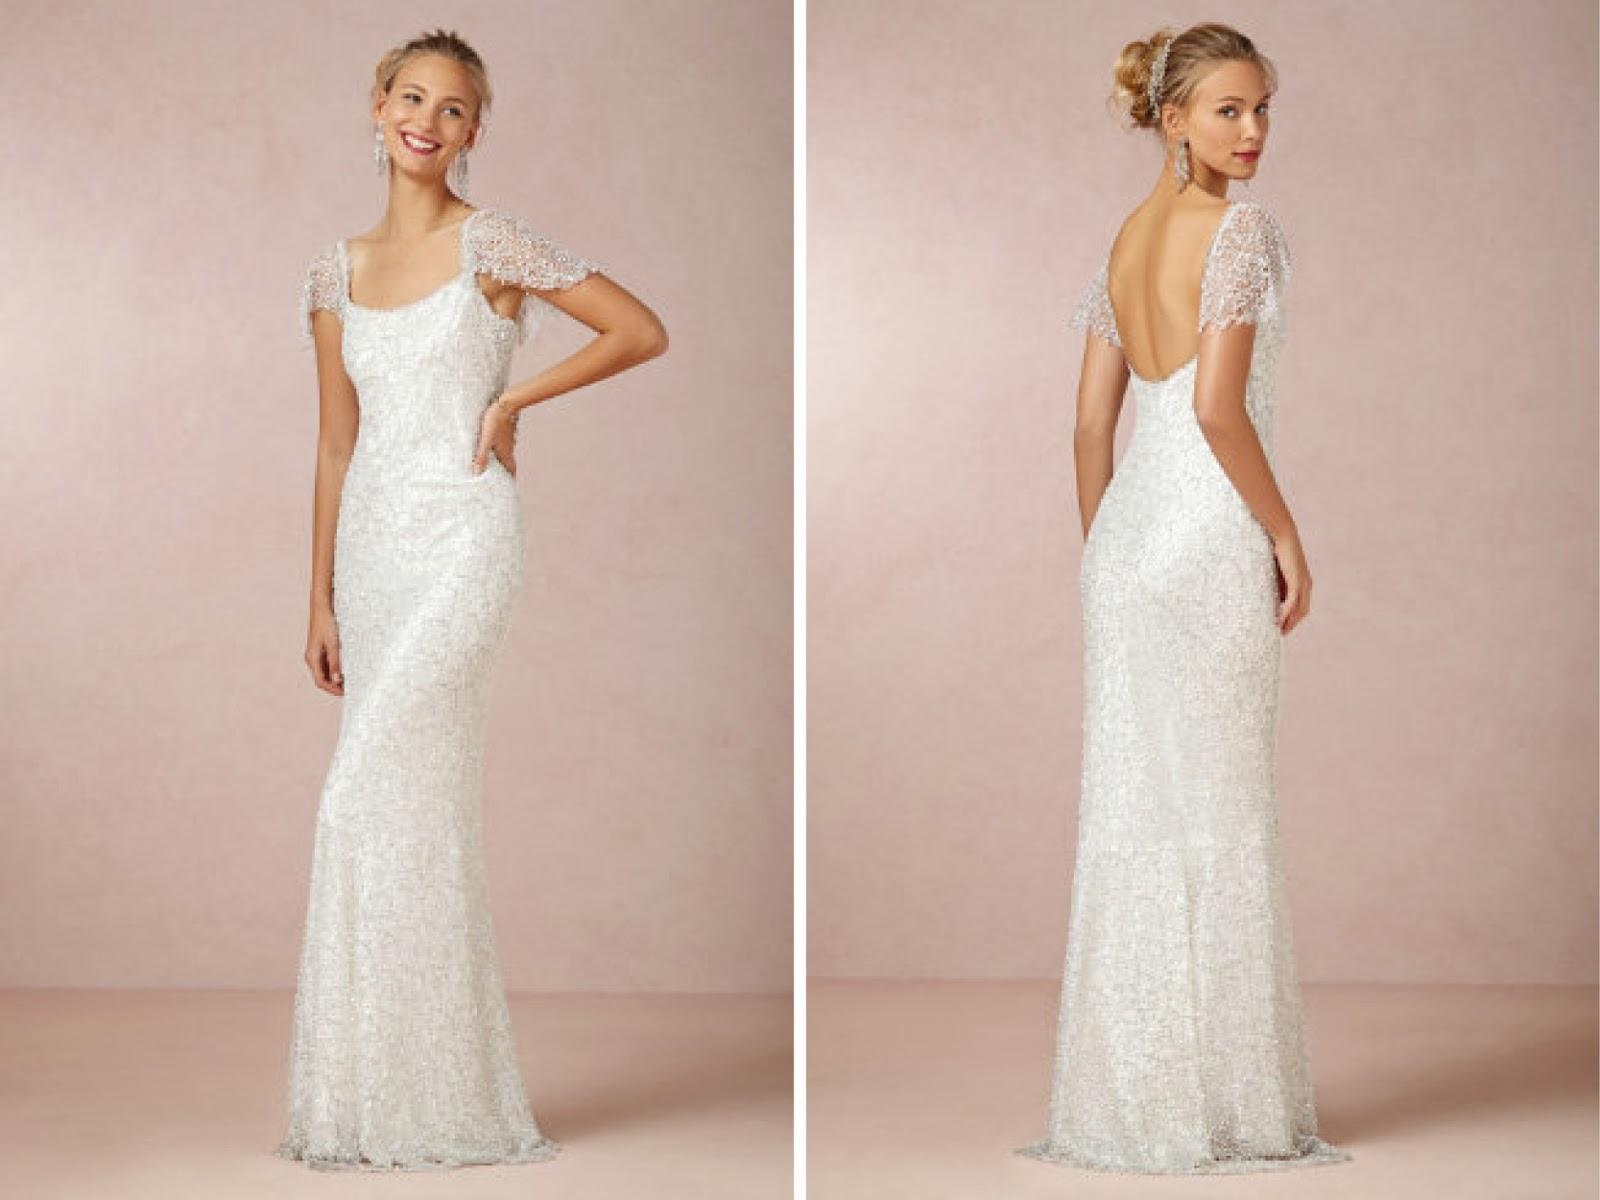 MILKTOAST: new dresses from bhldn.